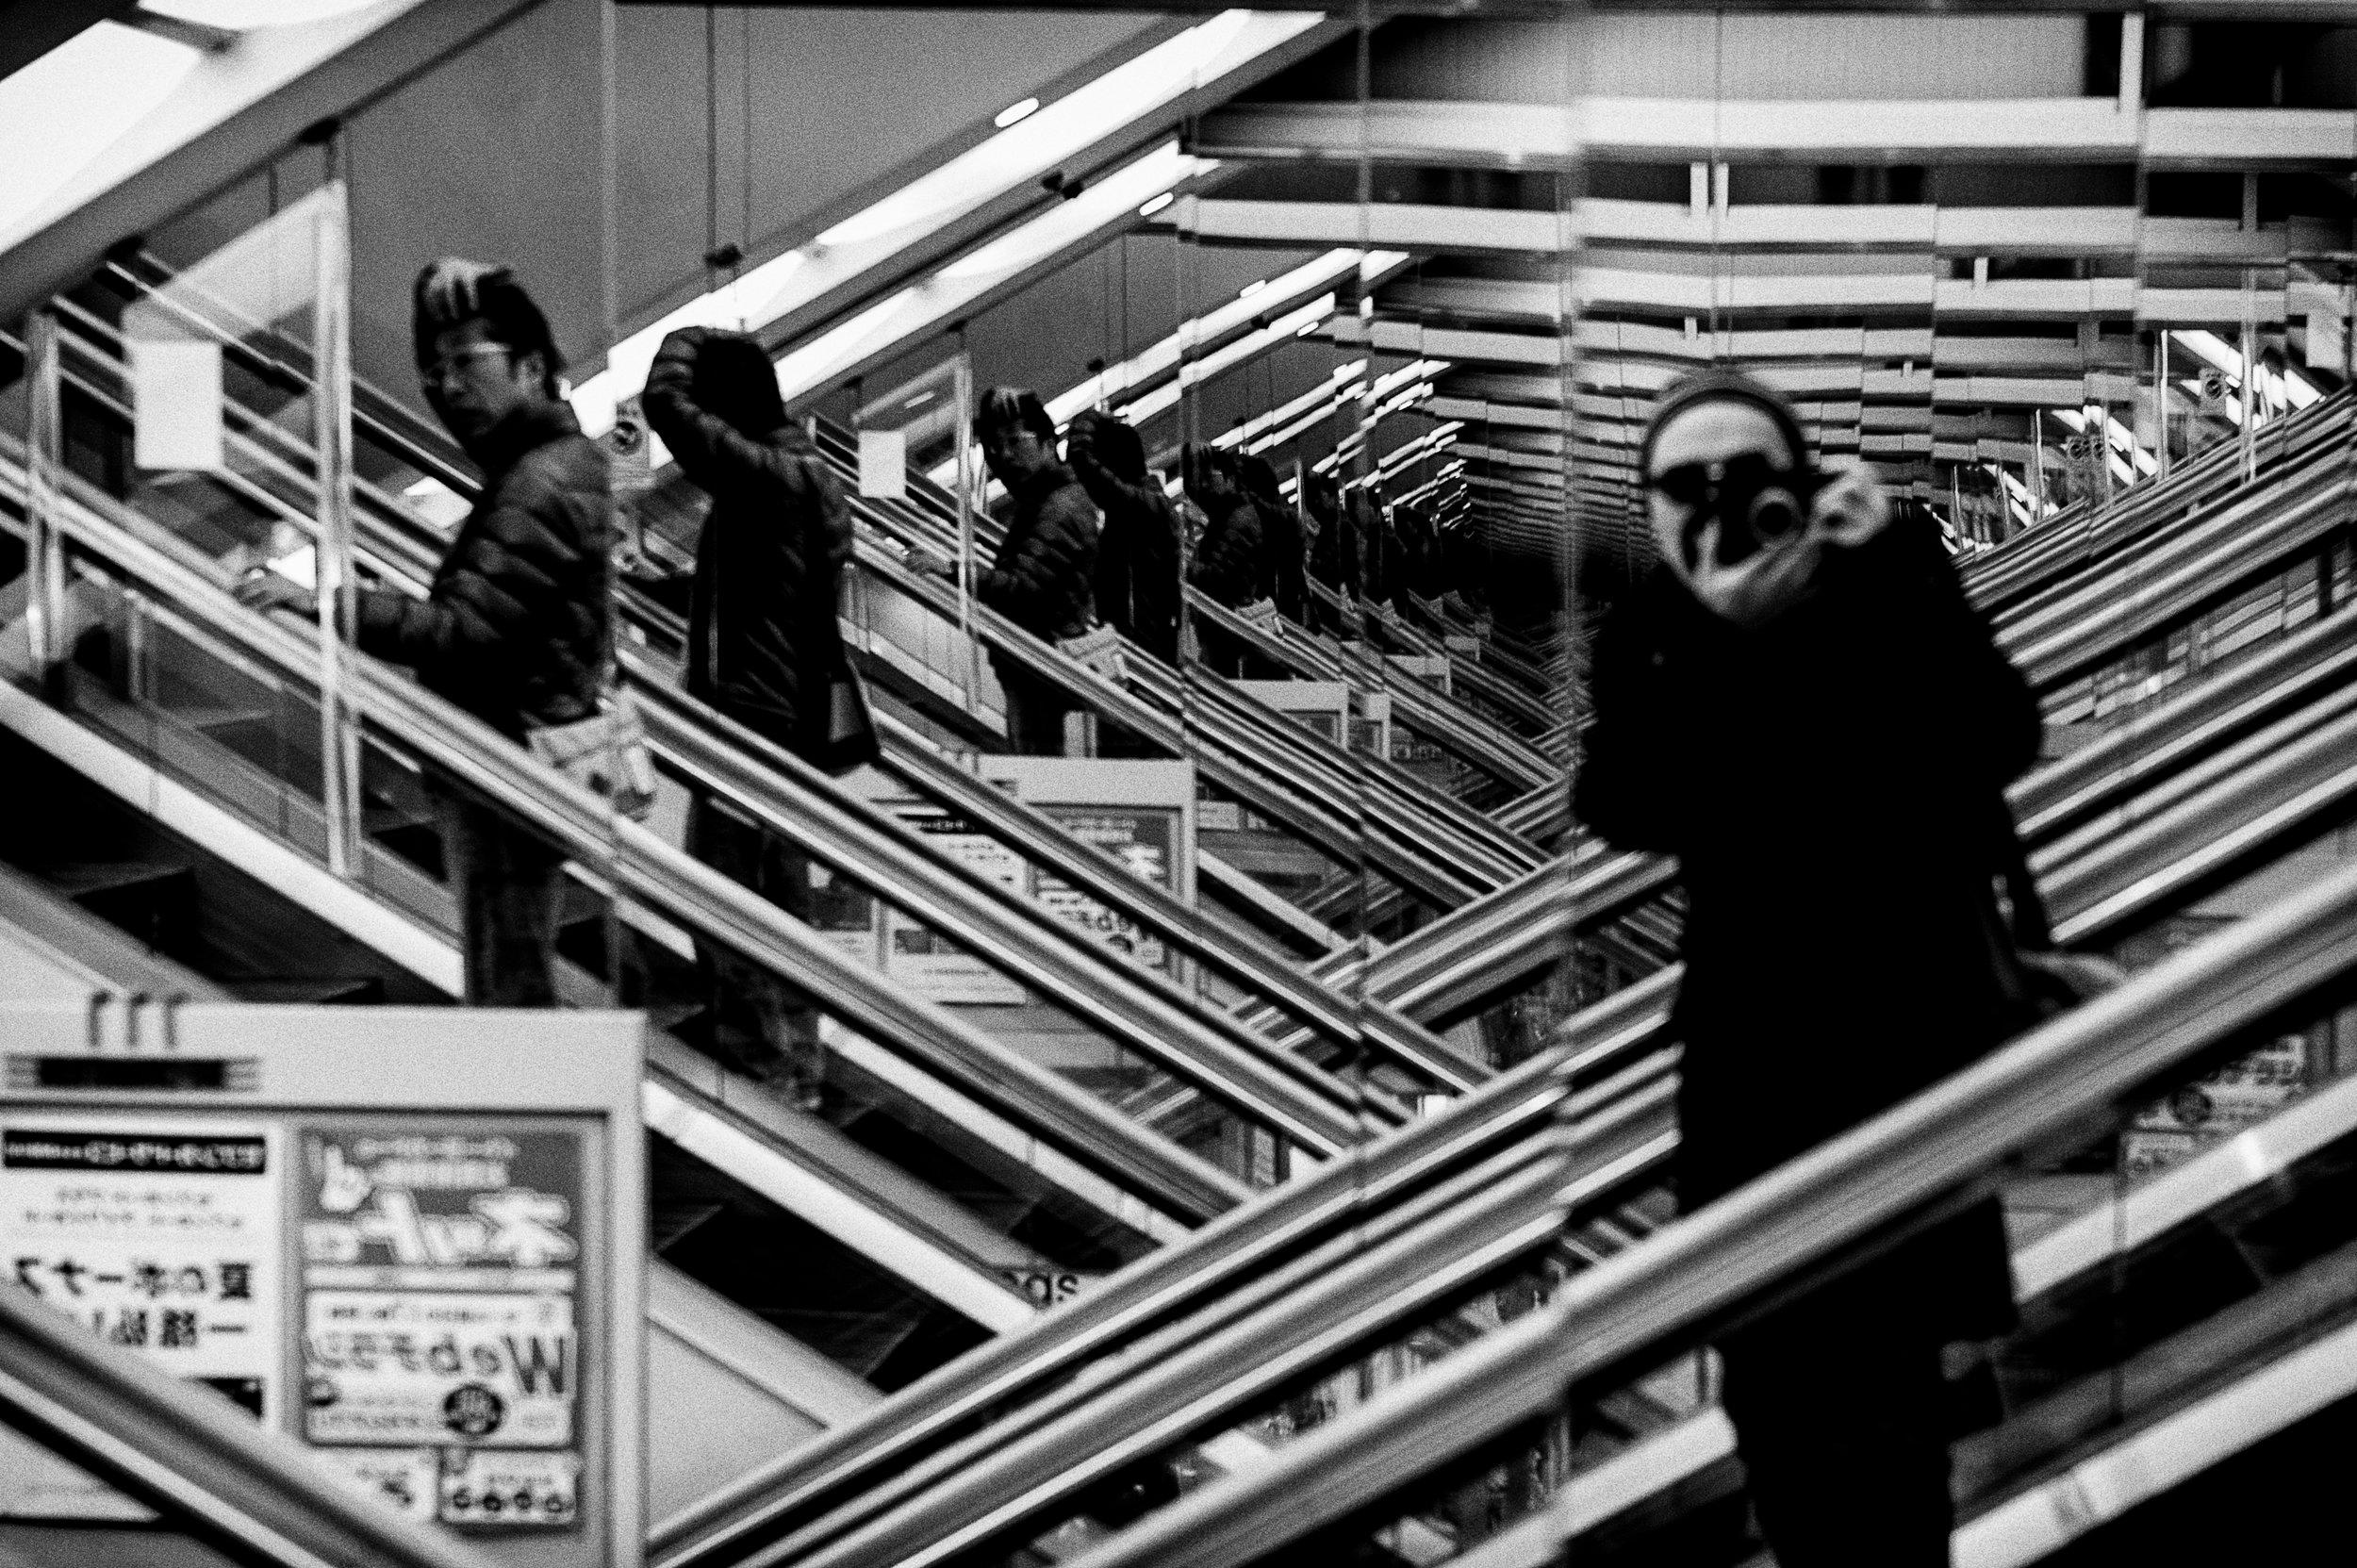 TakanoriTomimatsu  - On the Streets of Tokyo